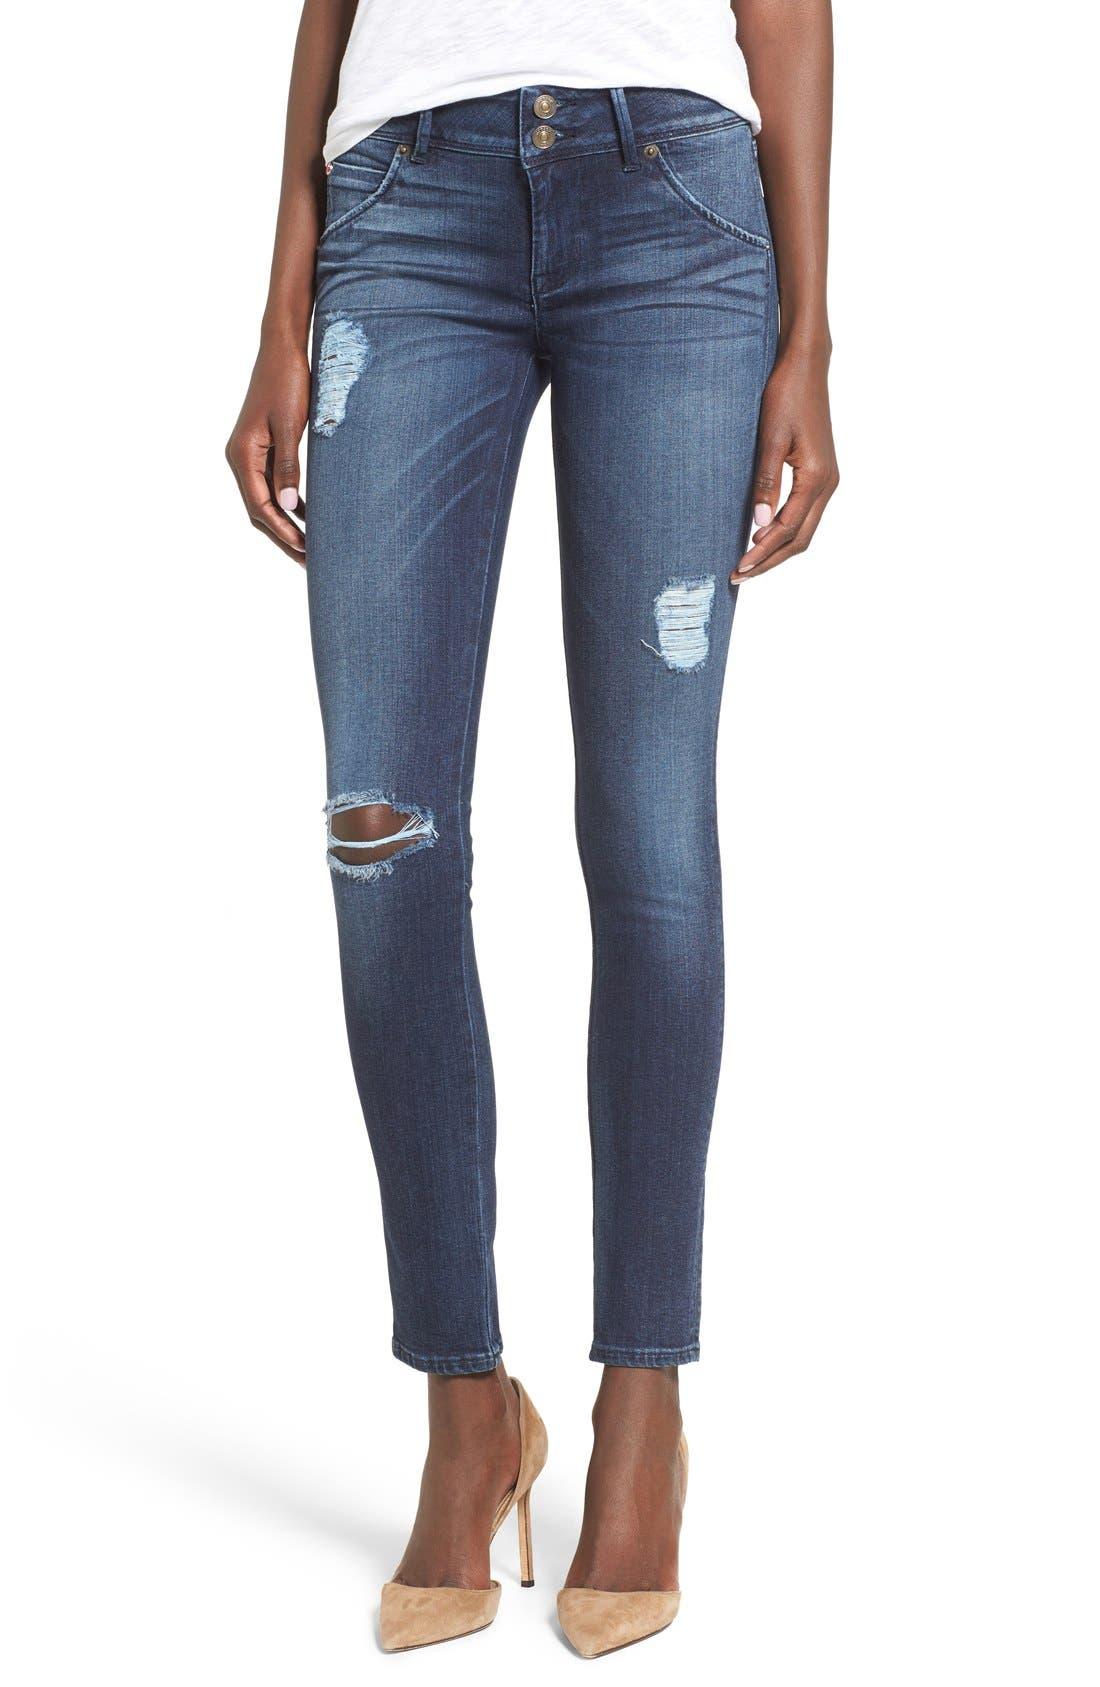 Alternate Image 1 Selected - Hudson Jeans 'Collin' Skinny Jeans (Anchor Light)